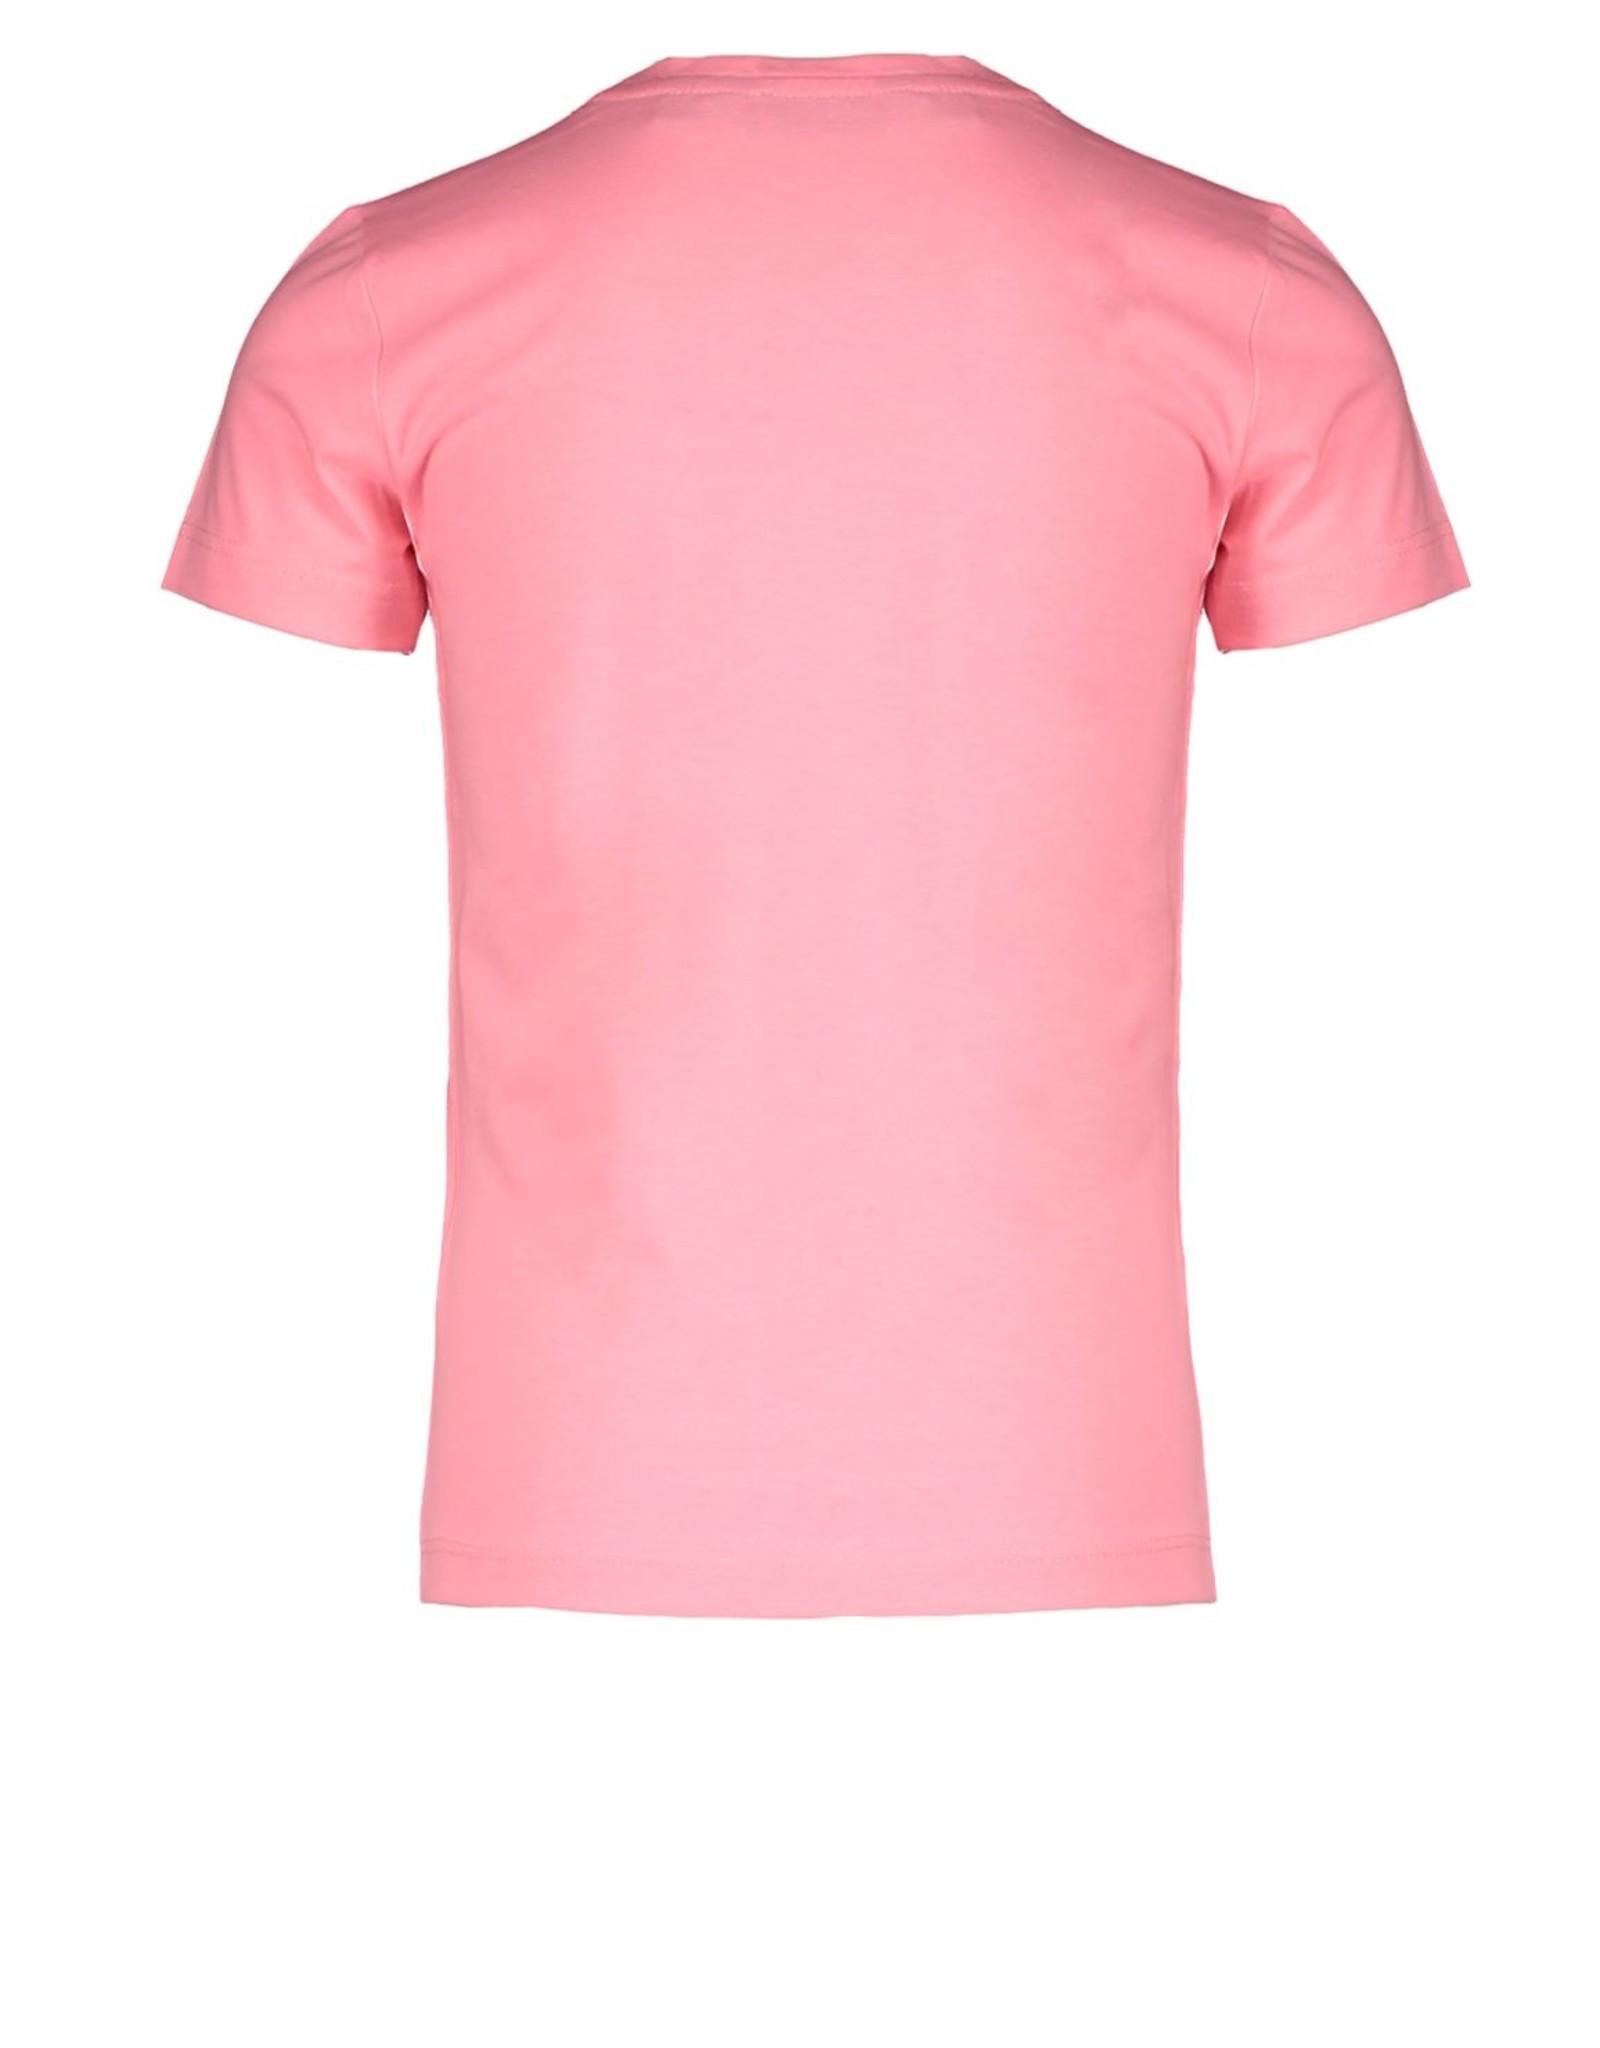 Moodstreet Moodstreet shirt 5400 Sparkling pink